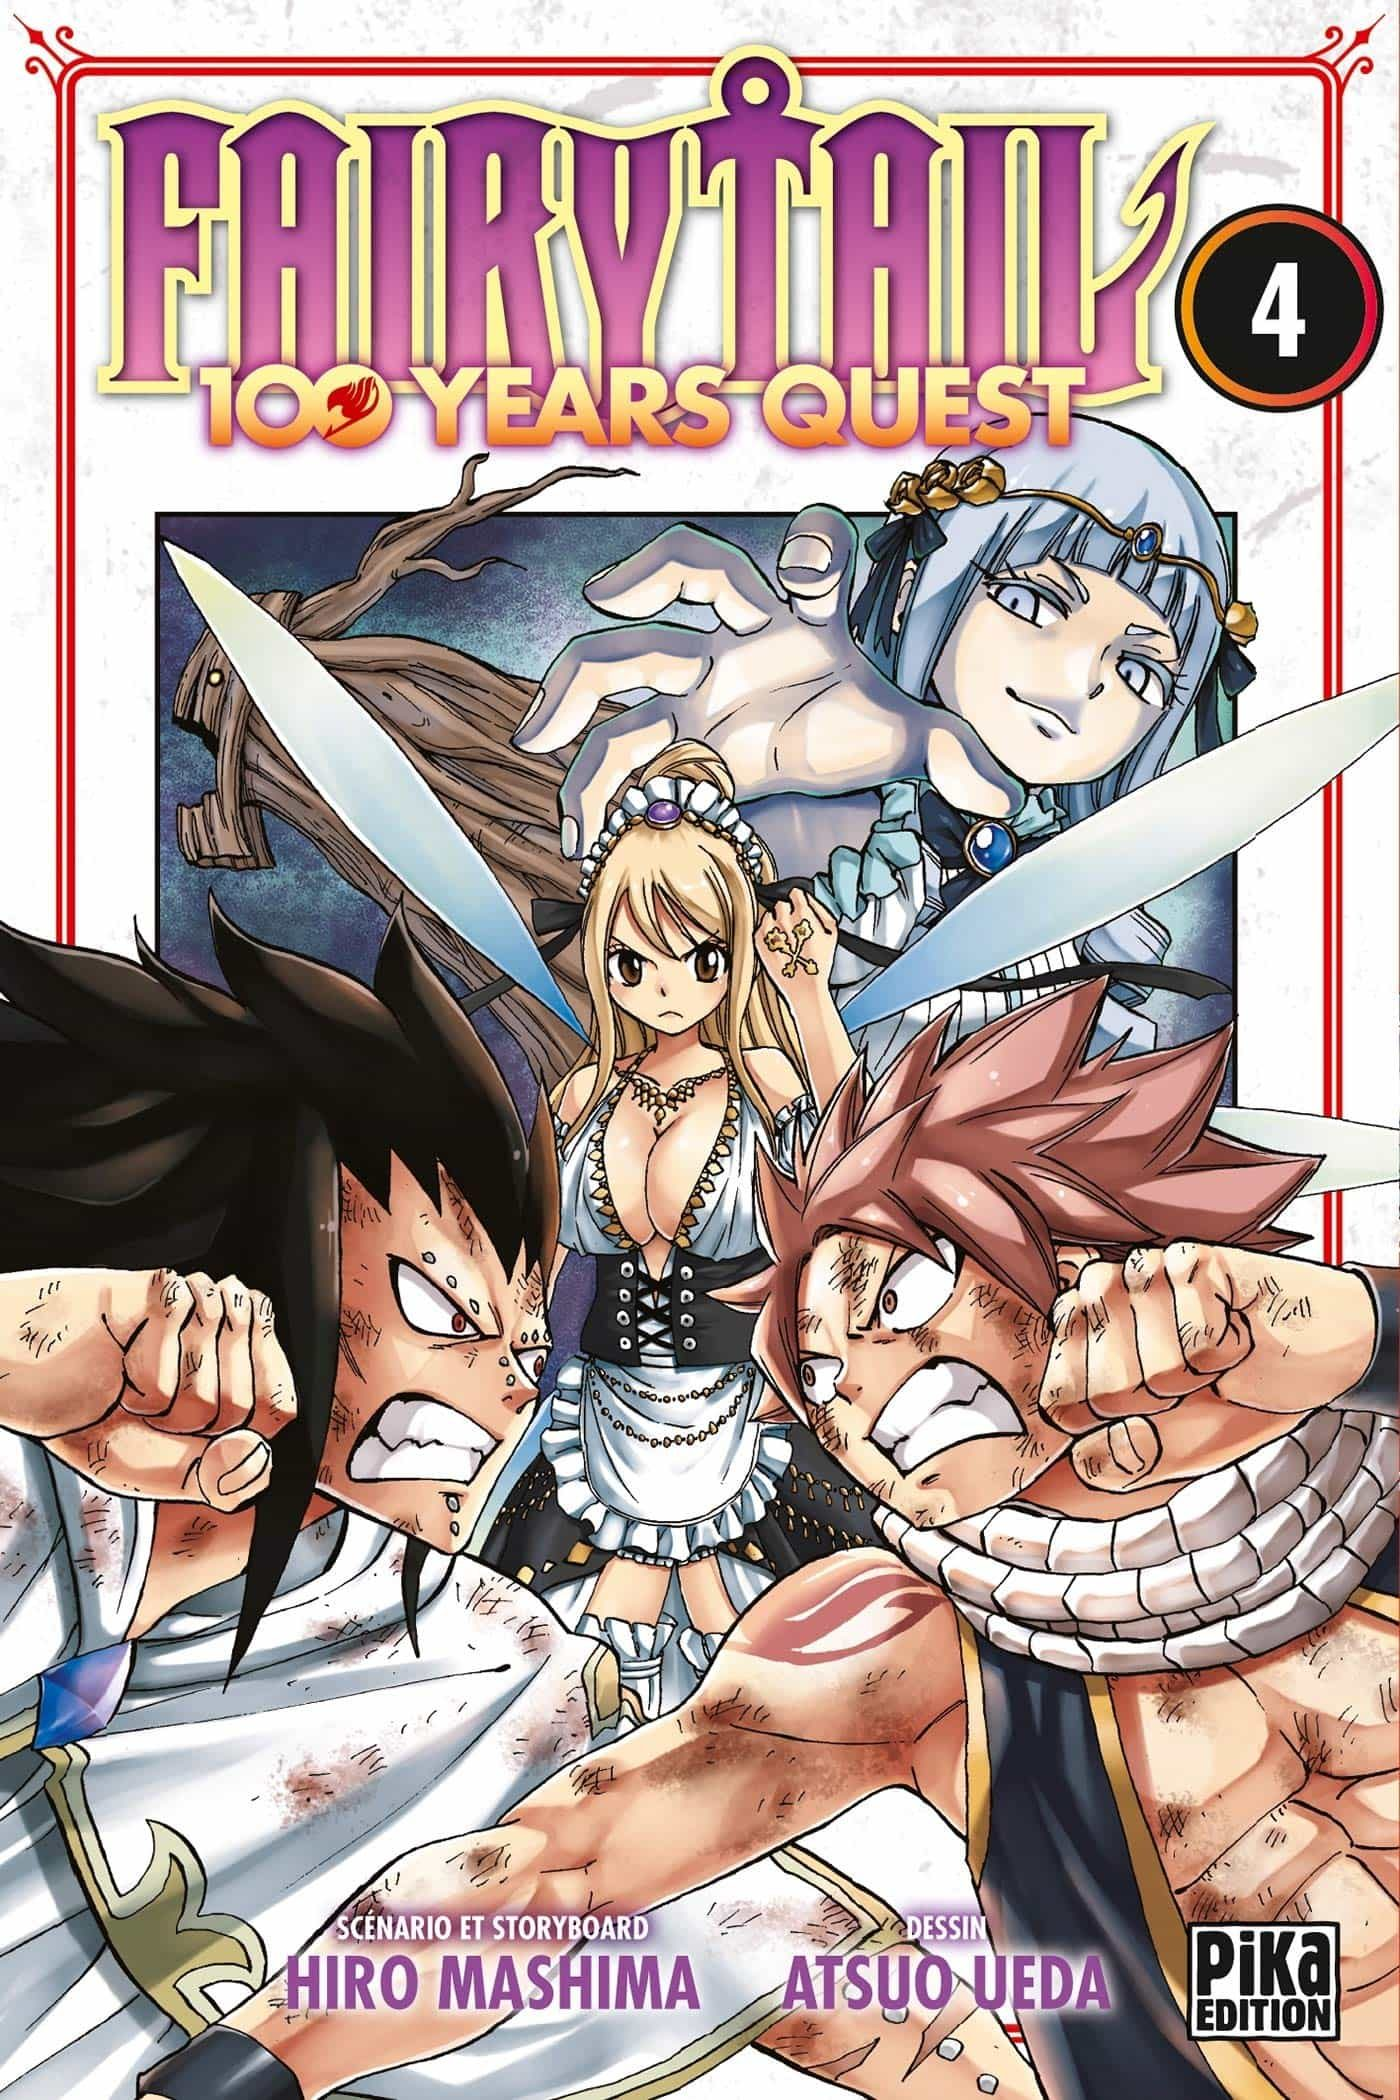 Fairy Tail : 100 Years Quest Volume 4 - Mashima Hiro